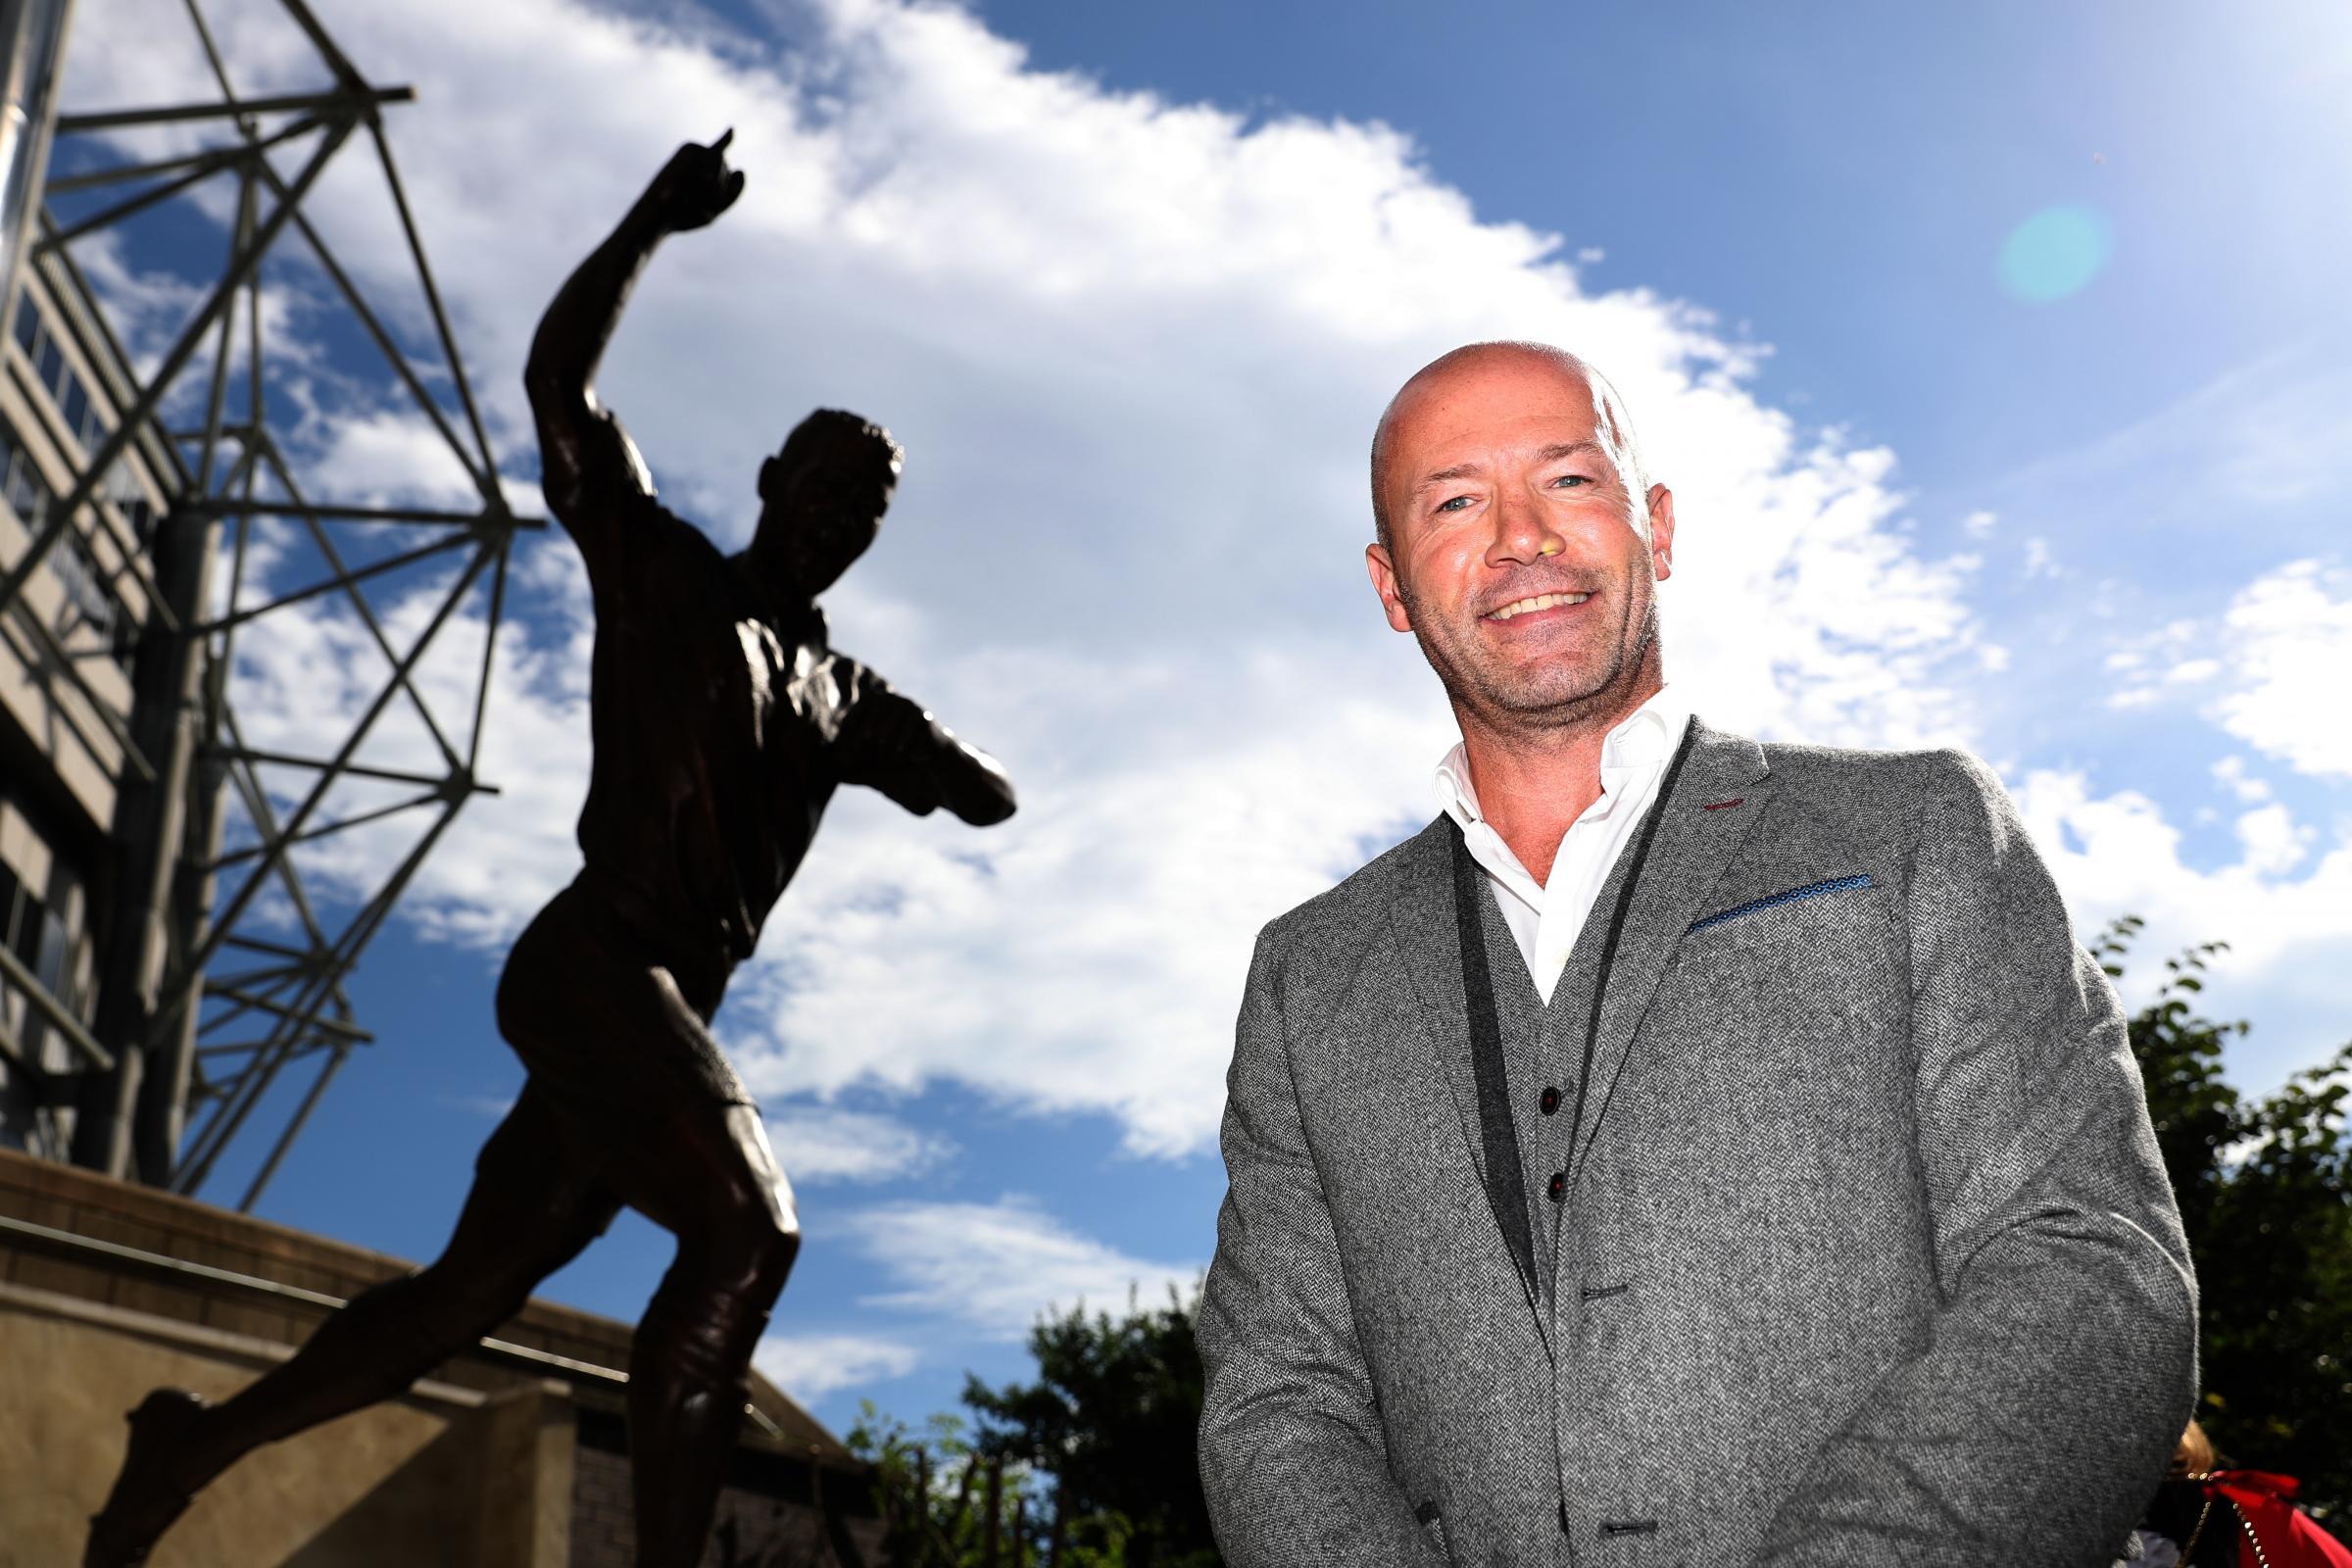 Newcastle ace Shearer slams club's FA Cup stance